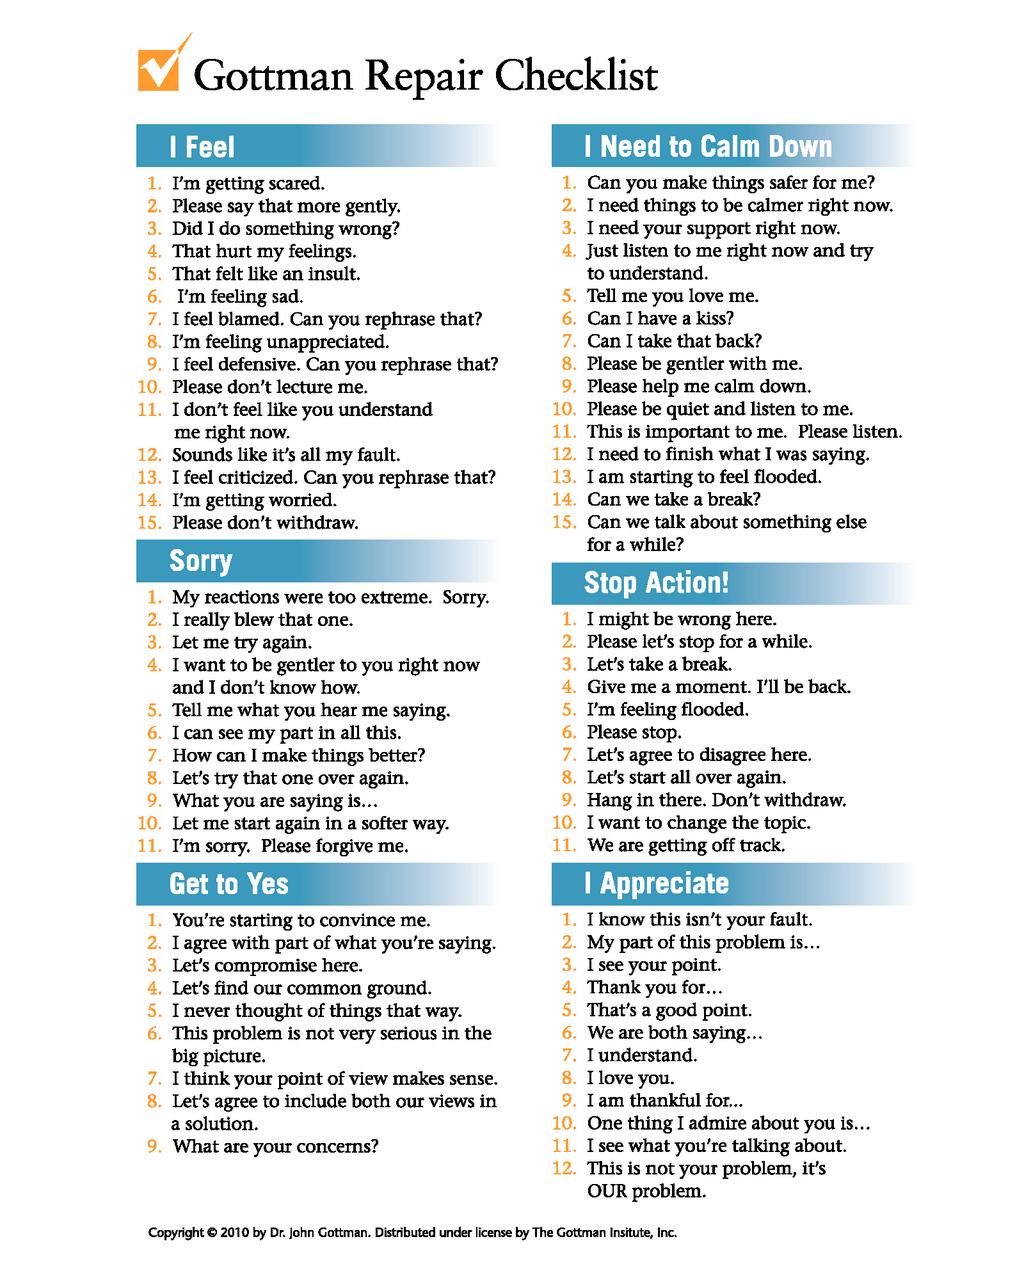 Psychologist John Gottman S Relationship Repair Checklist